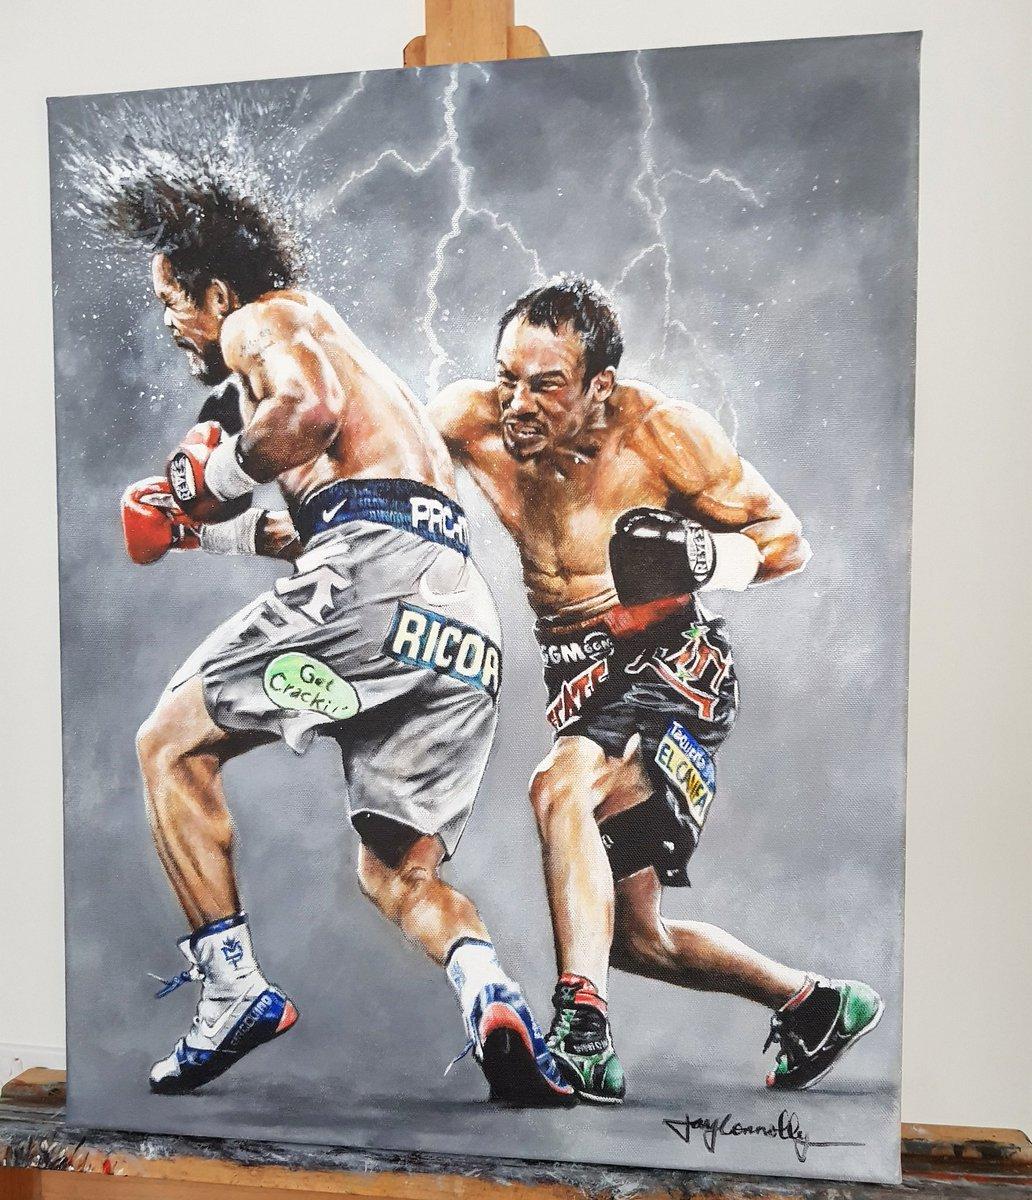 The moment @JMMarquezOf KO's @MannyPacquiao - Acrylic on canvas. <br>http://pic.twitter.com/dbJjRRcRok